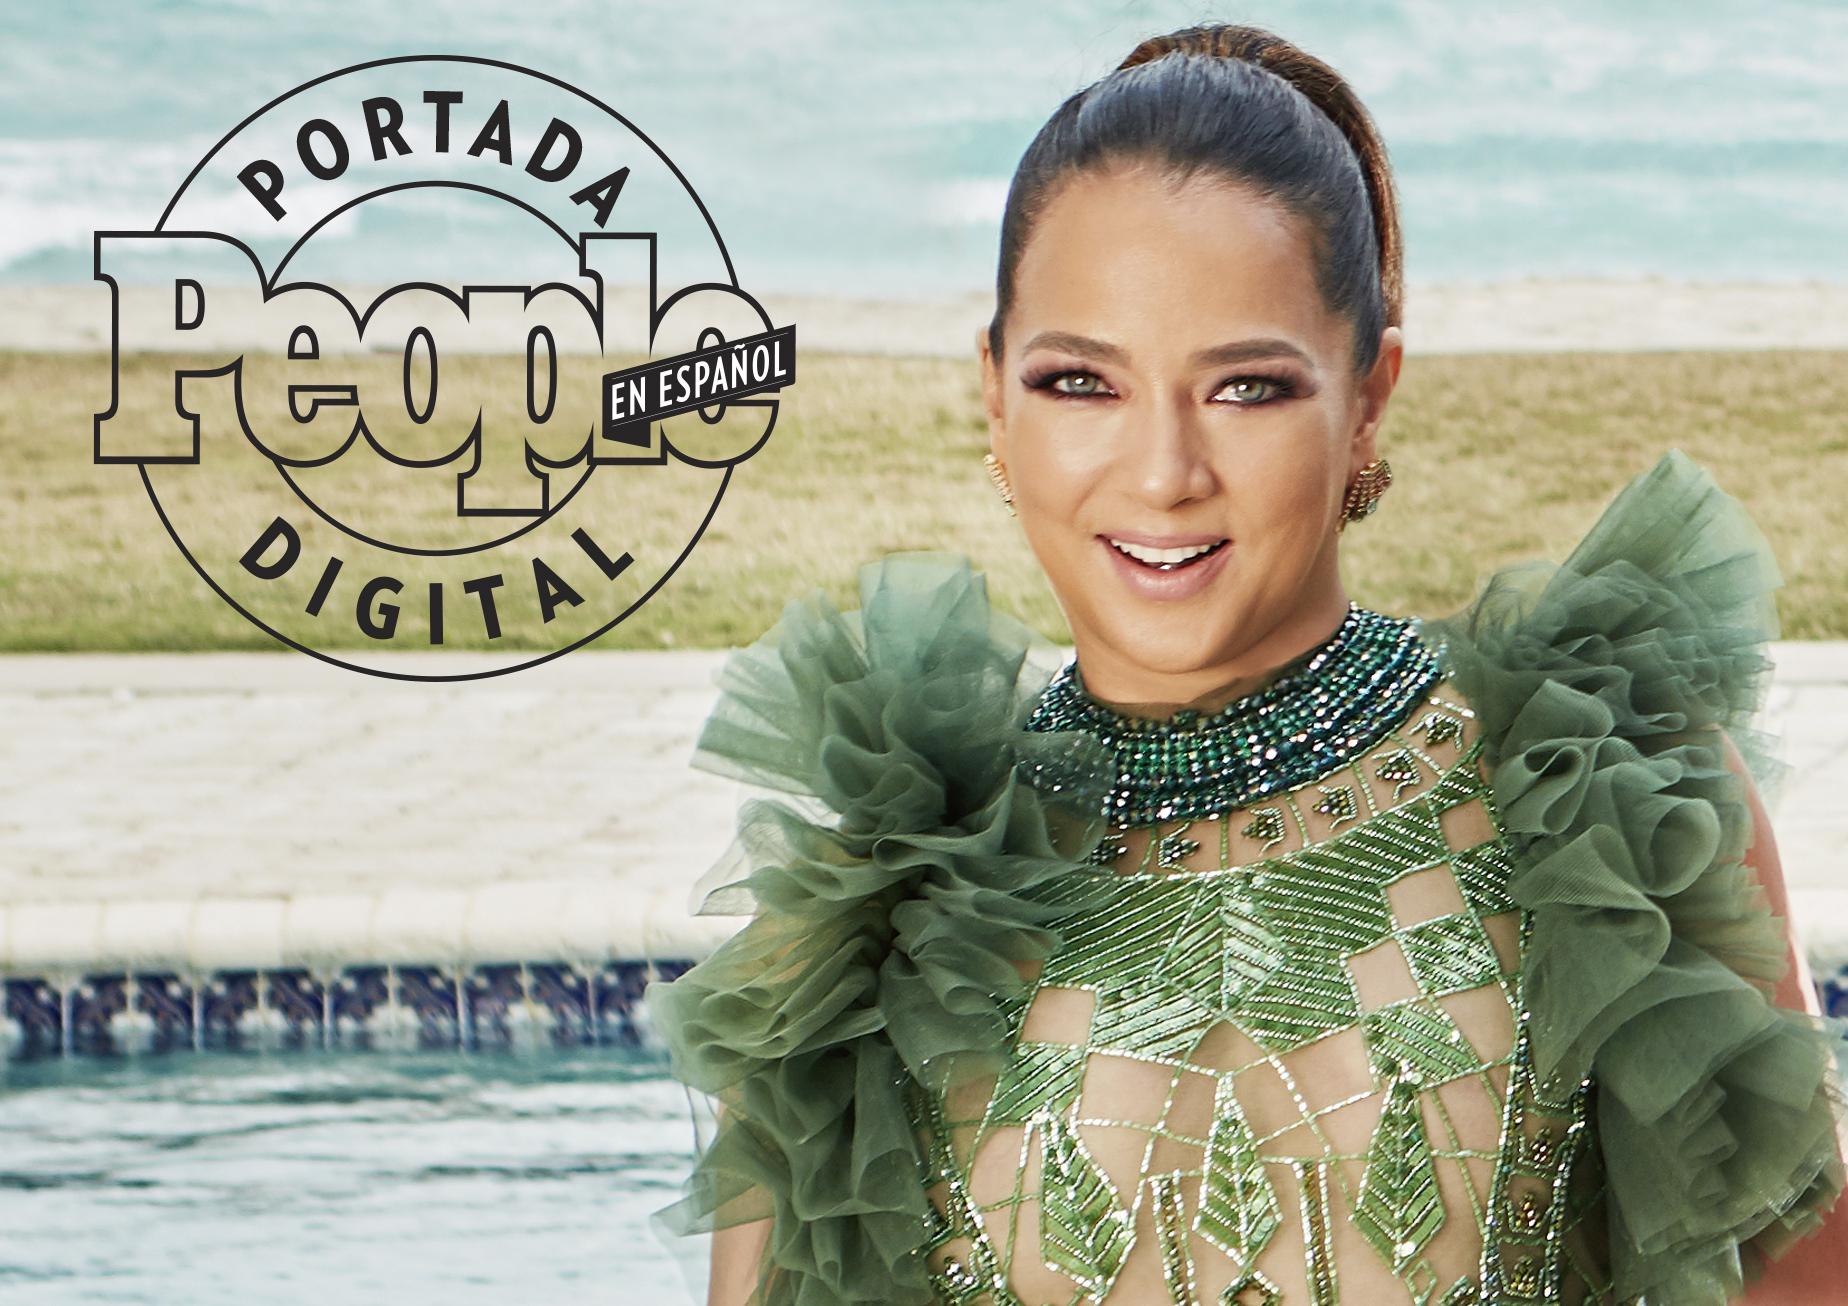 Adamari Lopez promo home page - Digital Cover - DO NOT REUSE